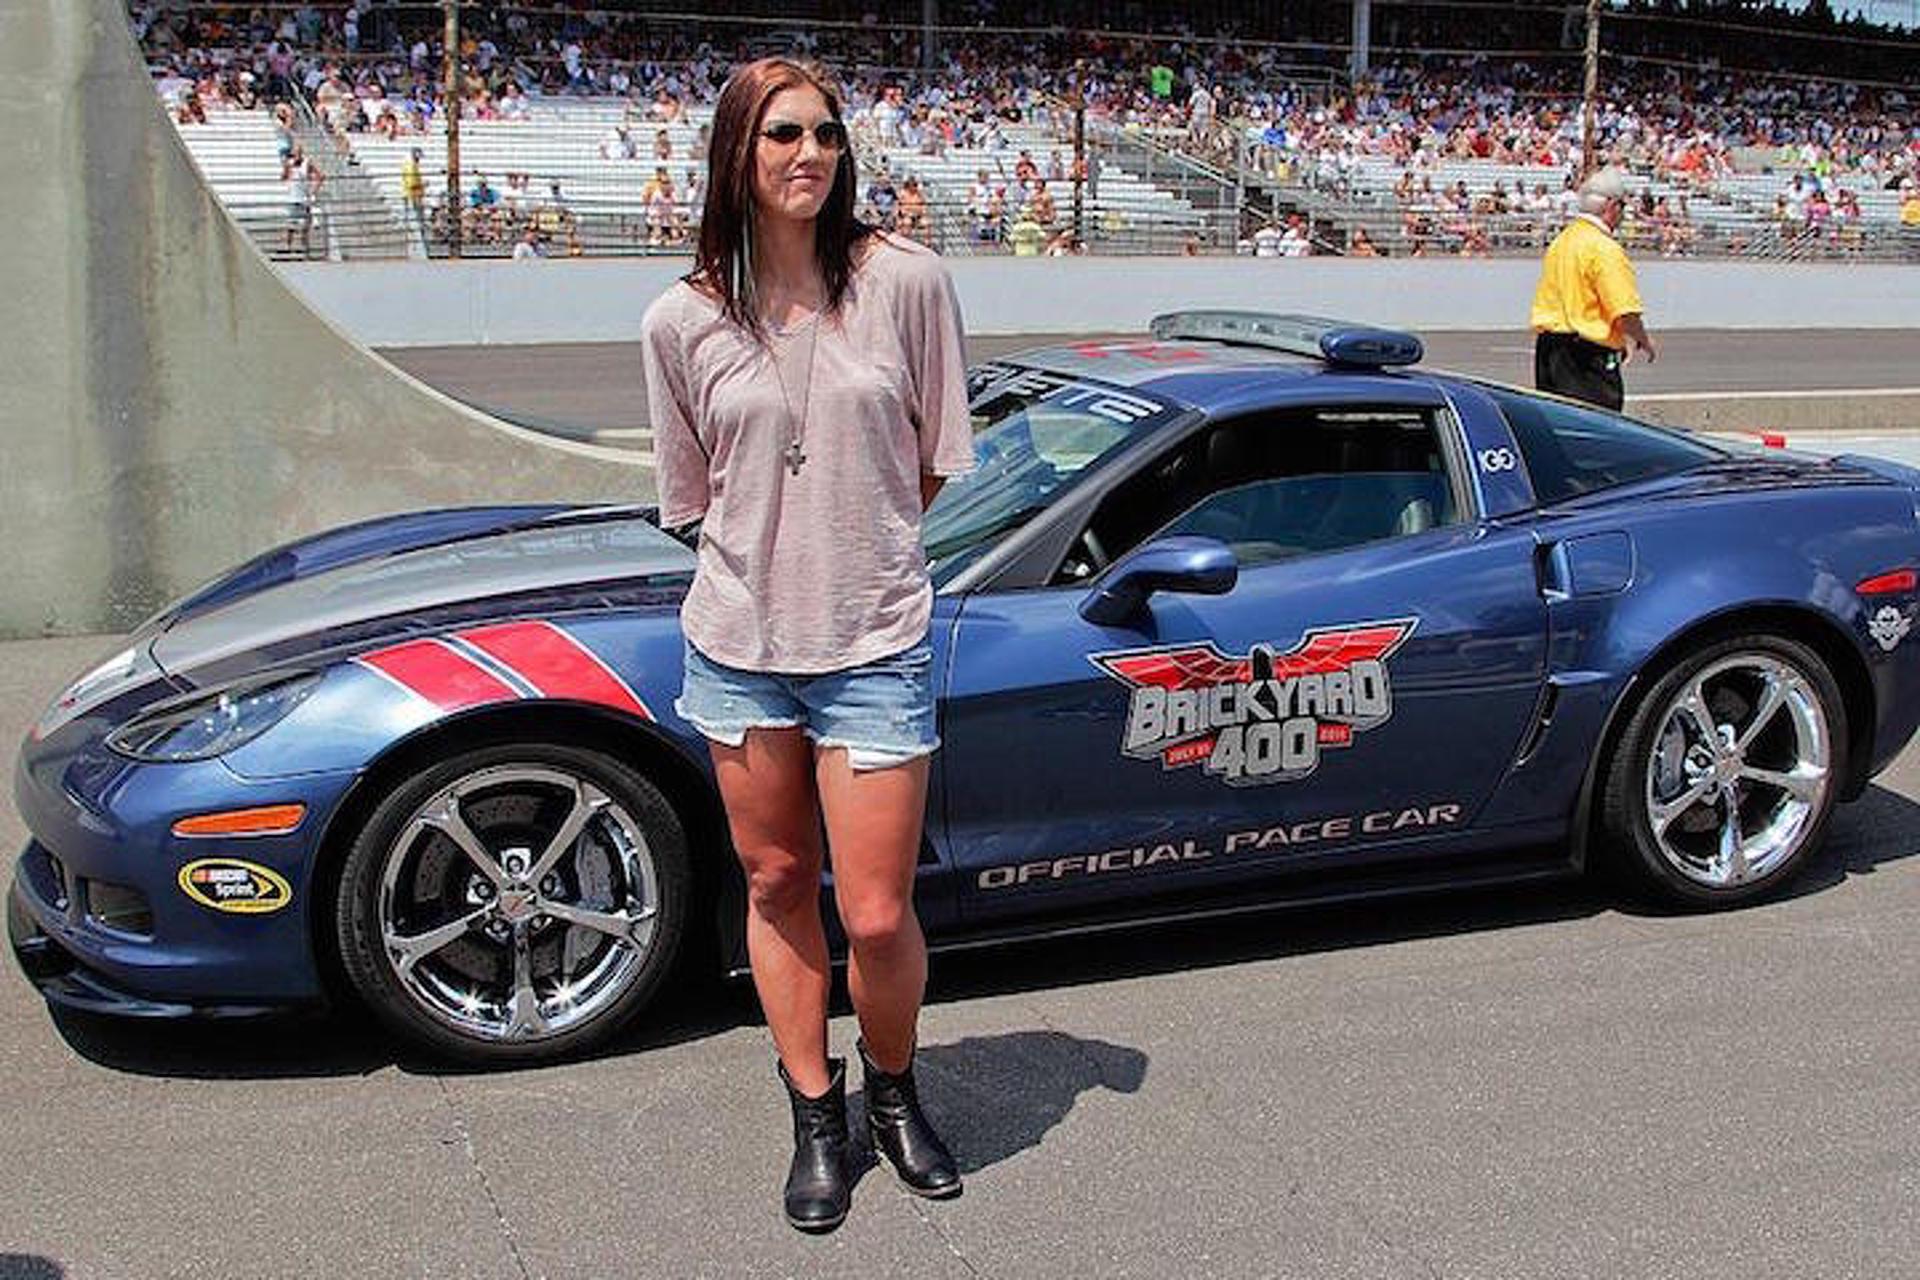 Remember When Hope Solo Drove a Corvette Pace Car?